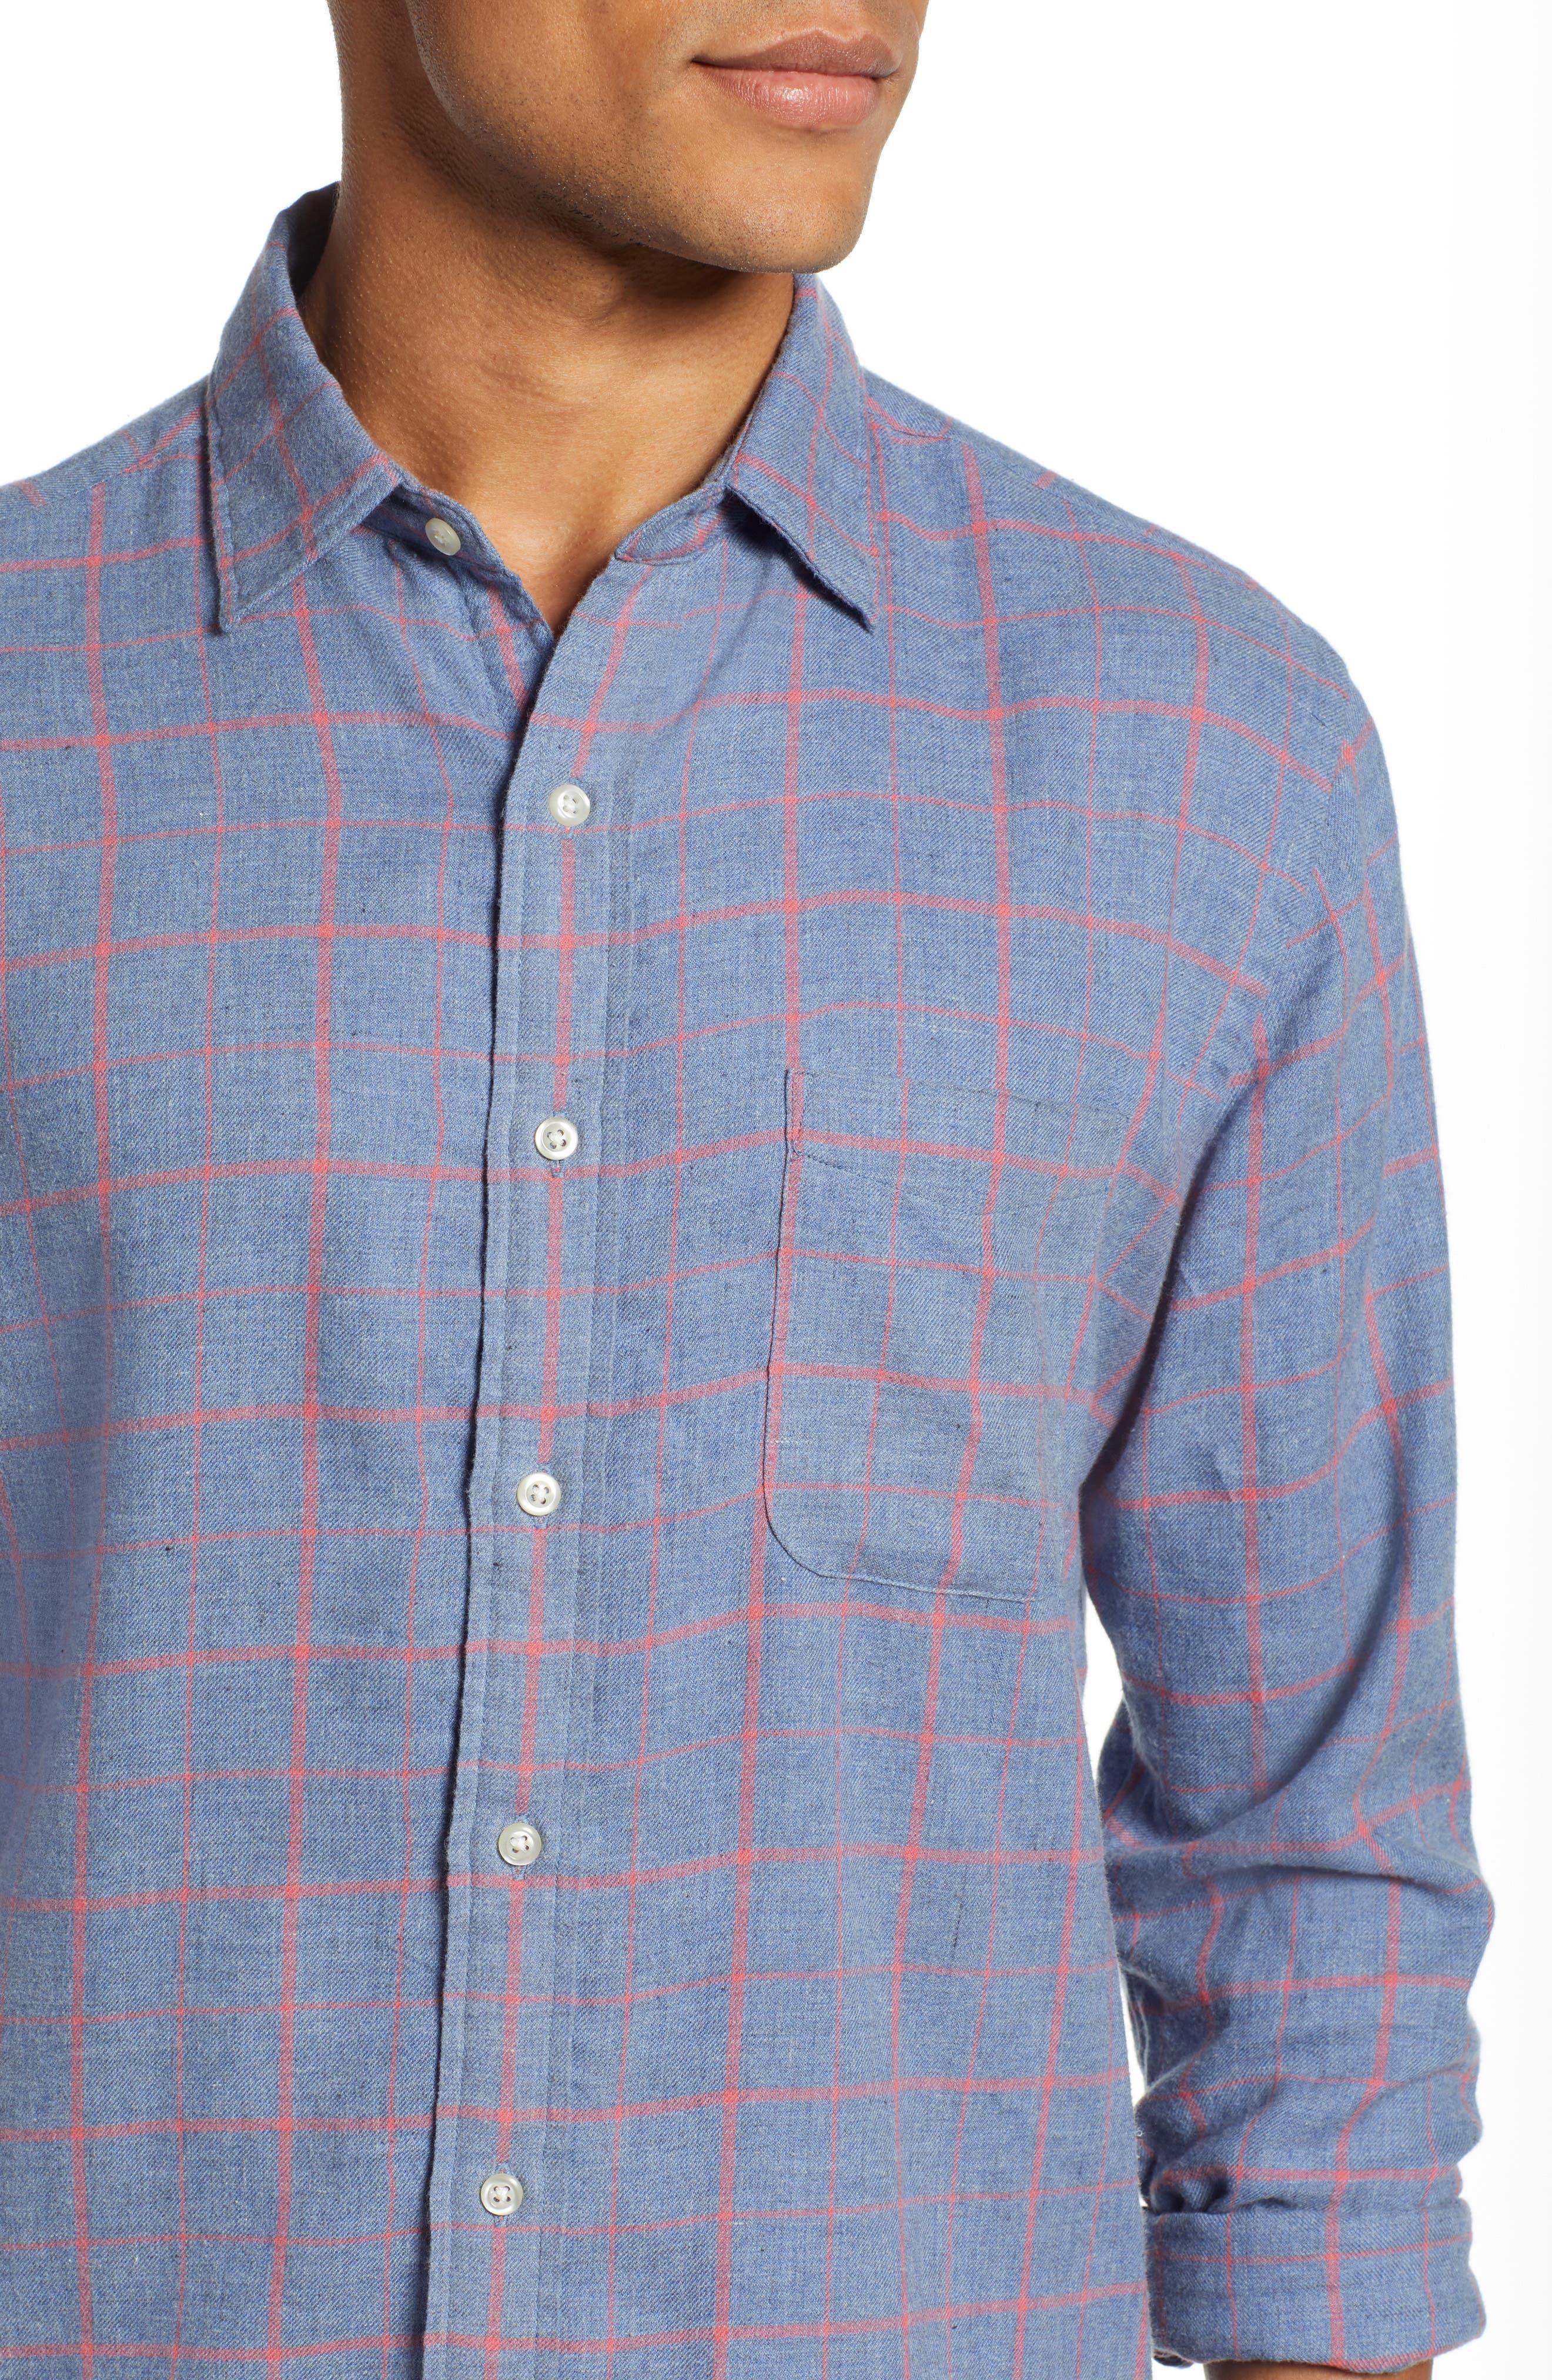 Ventura Windowpane Sport Shirt,                             Alternate thumbnail 2, color,                             BLUE MELANGE WINDOWPANE